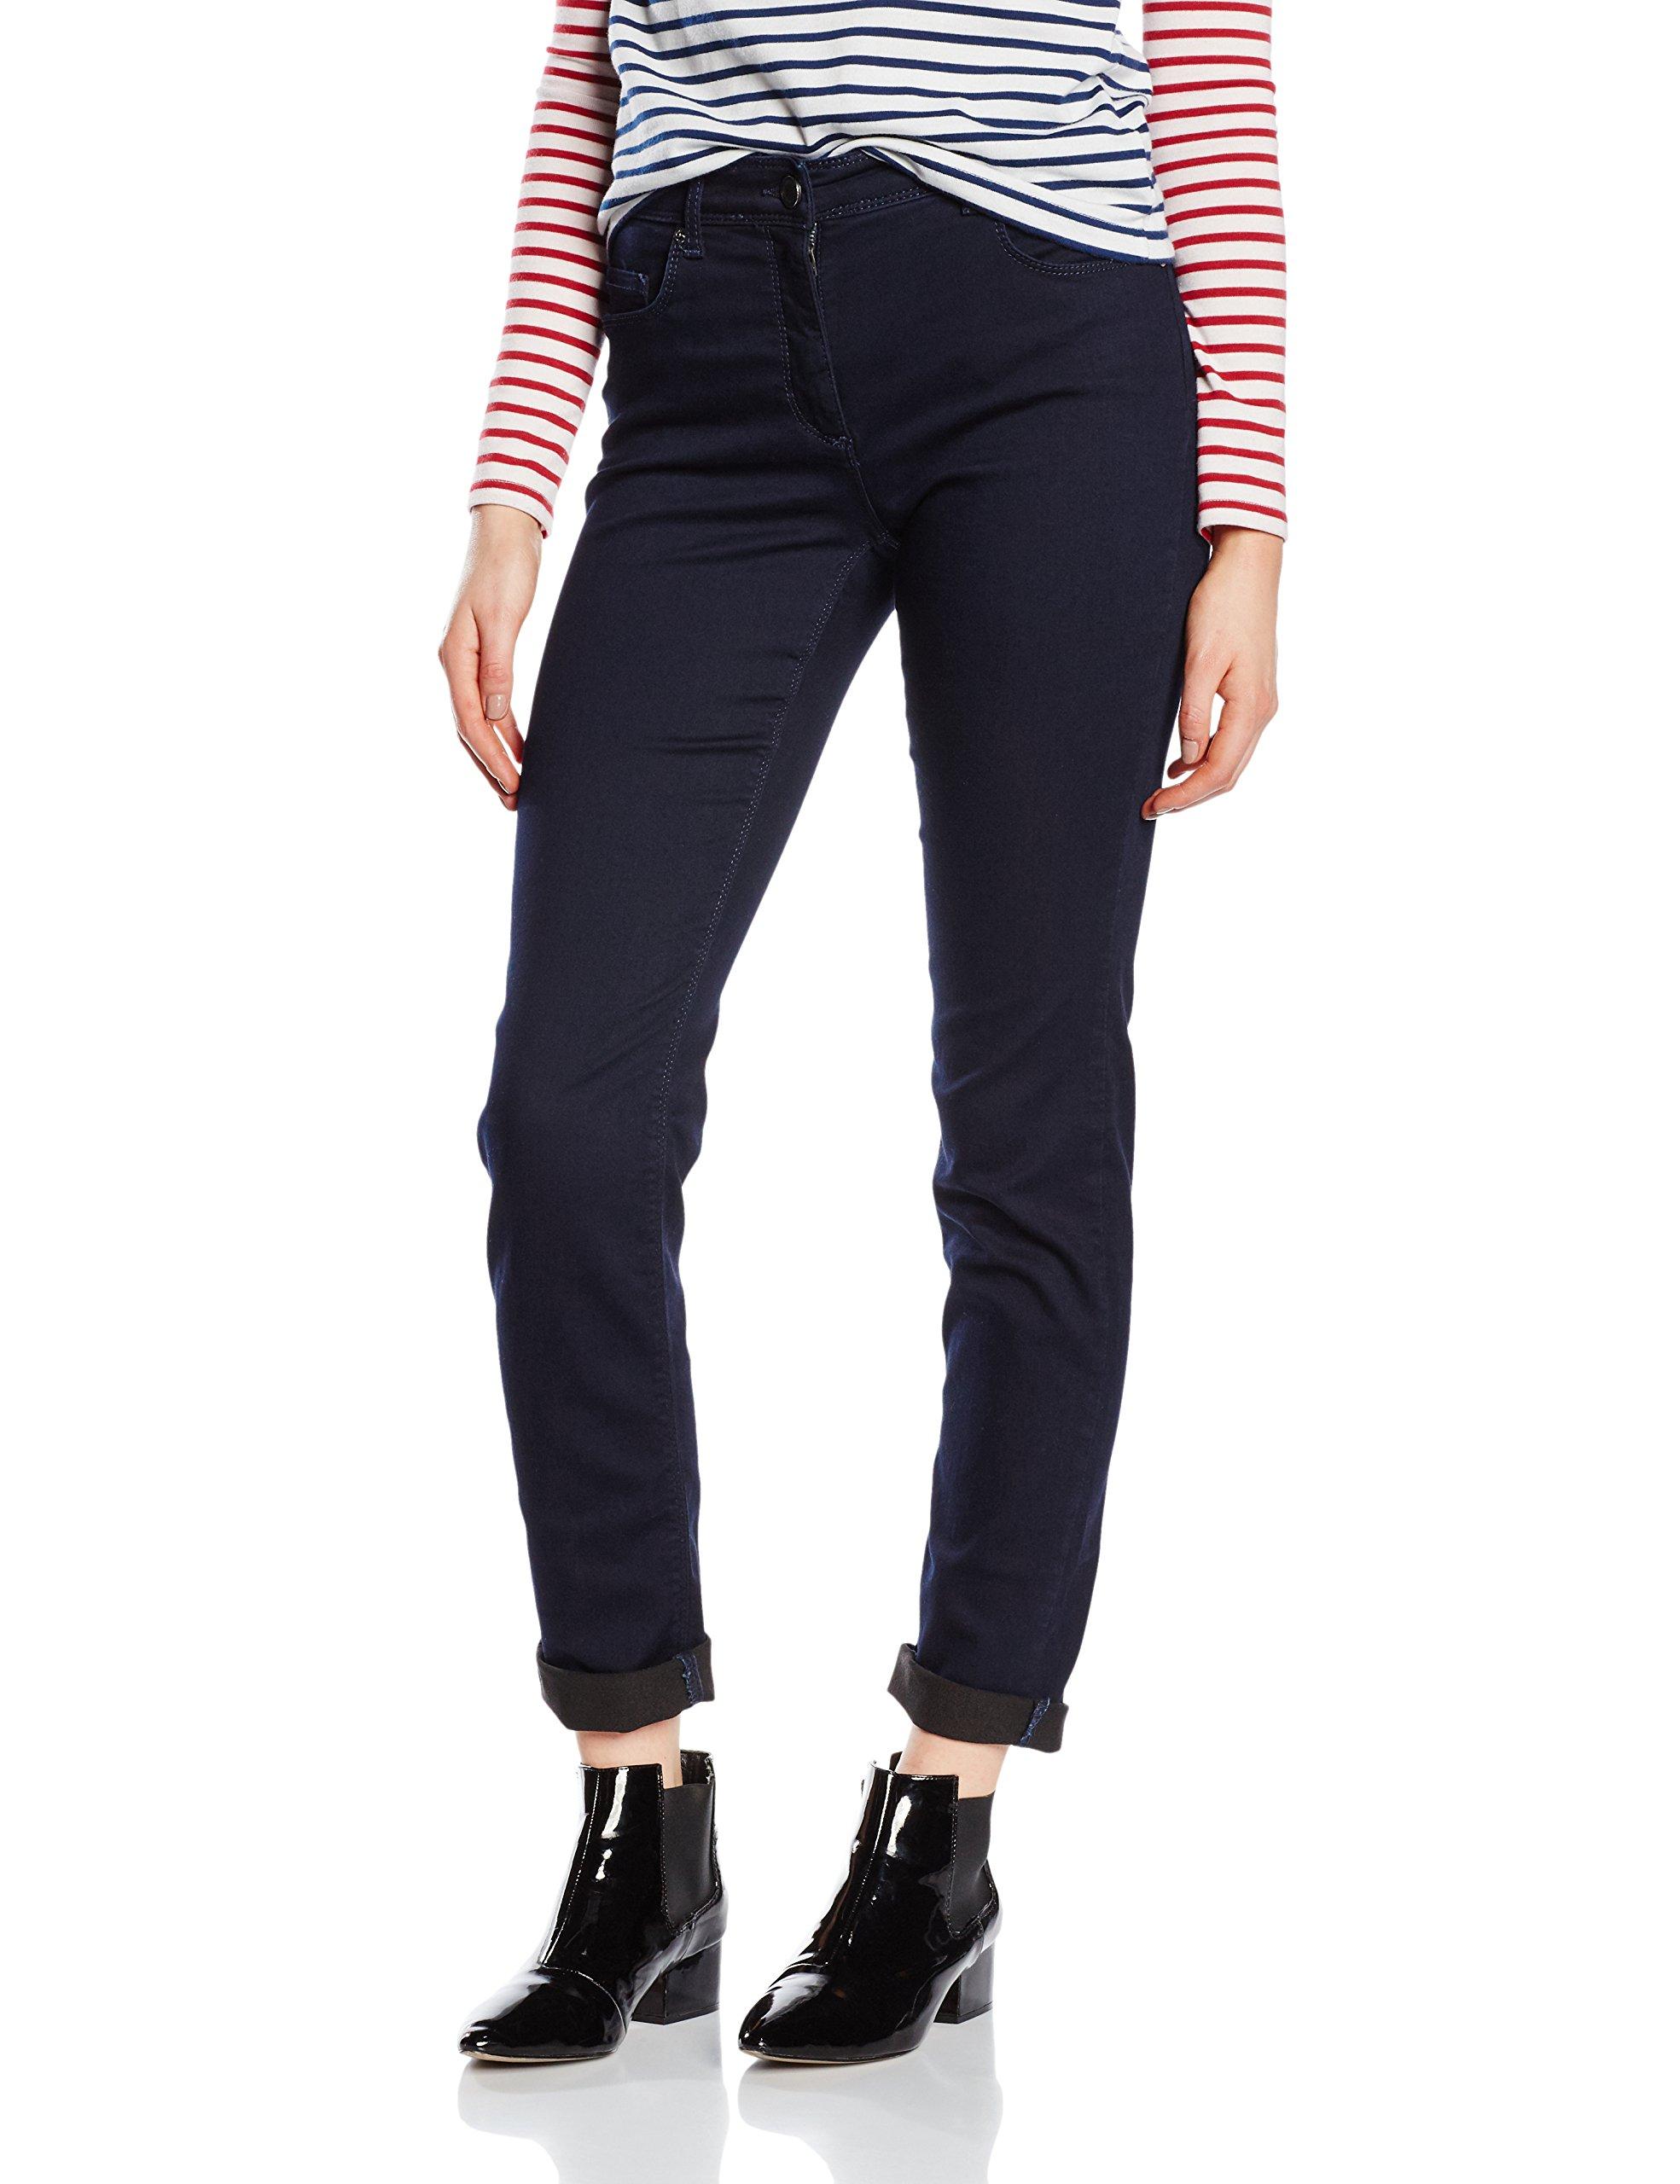 Betty Blue FemmeBleudeep Denim 862450 PerfectJeans Barclay Slim jLqA34R5